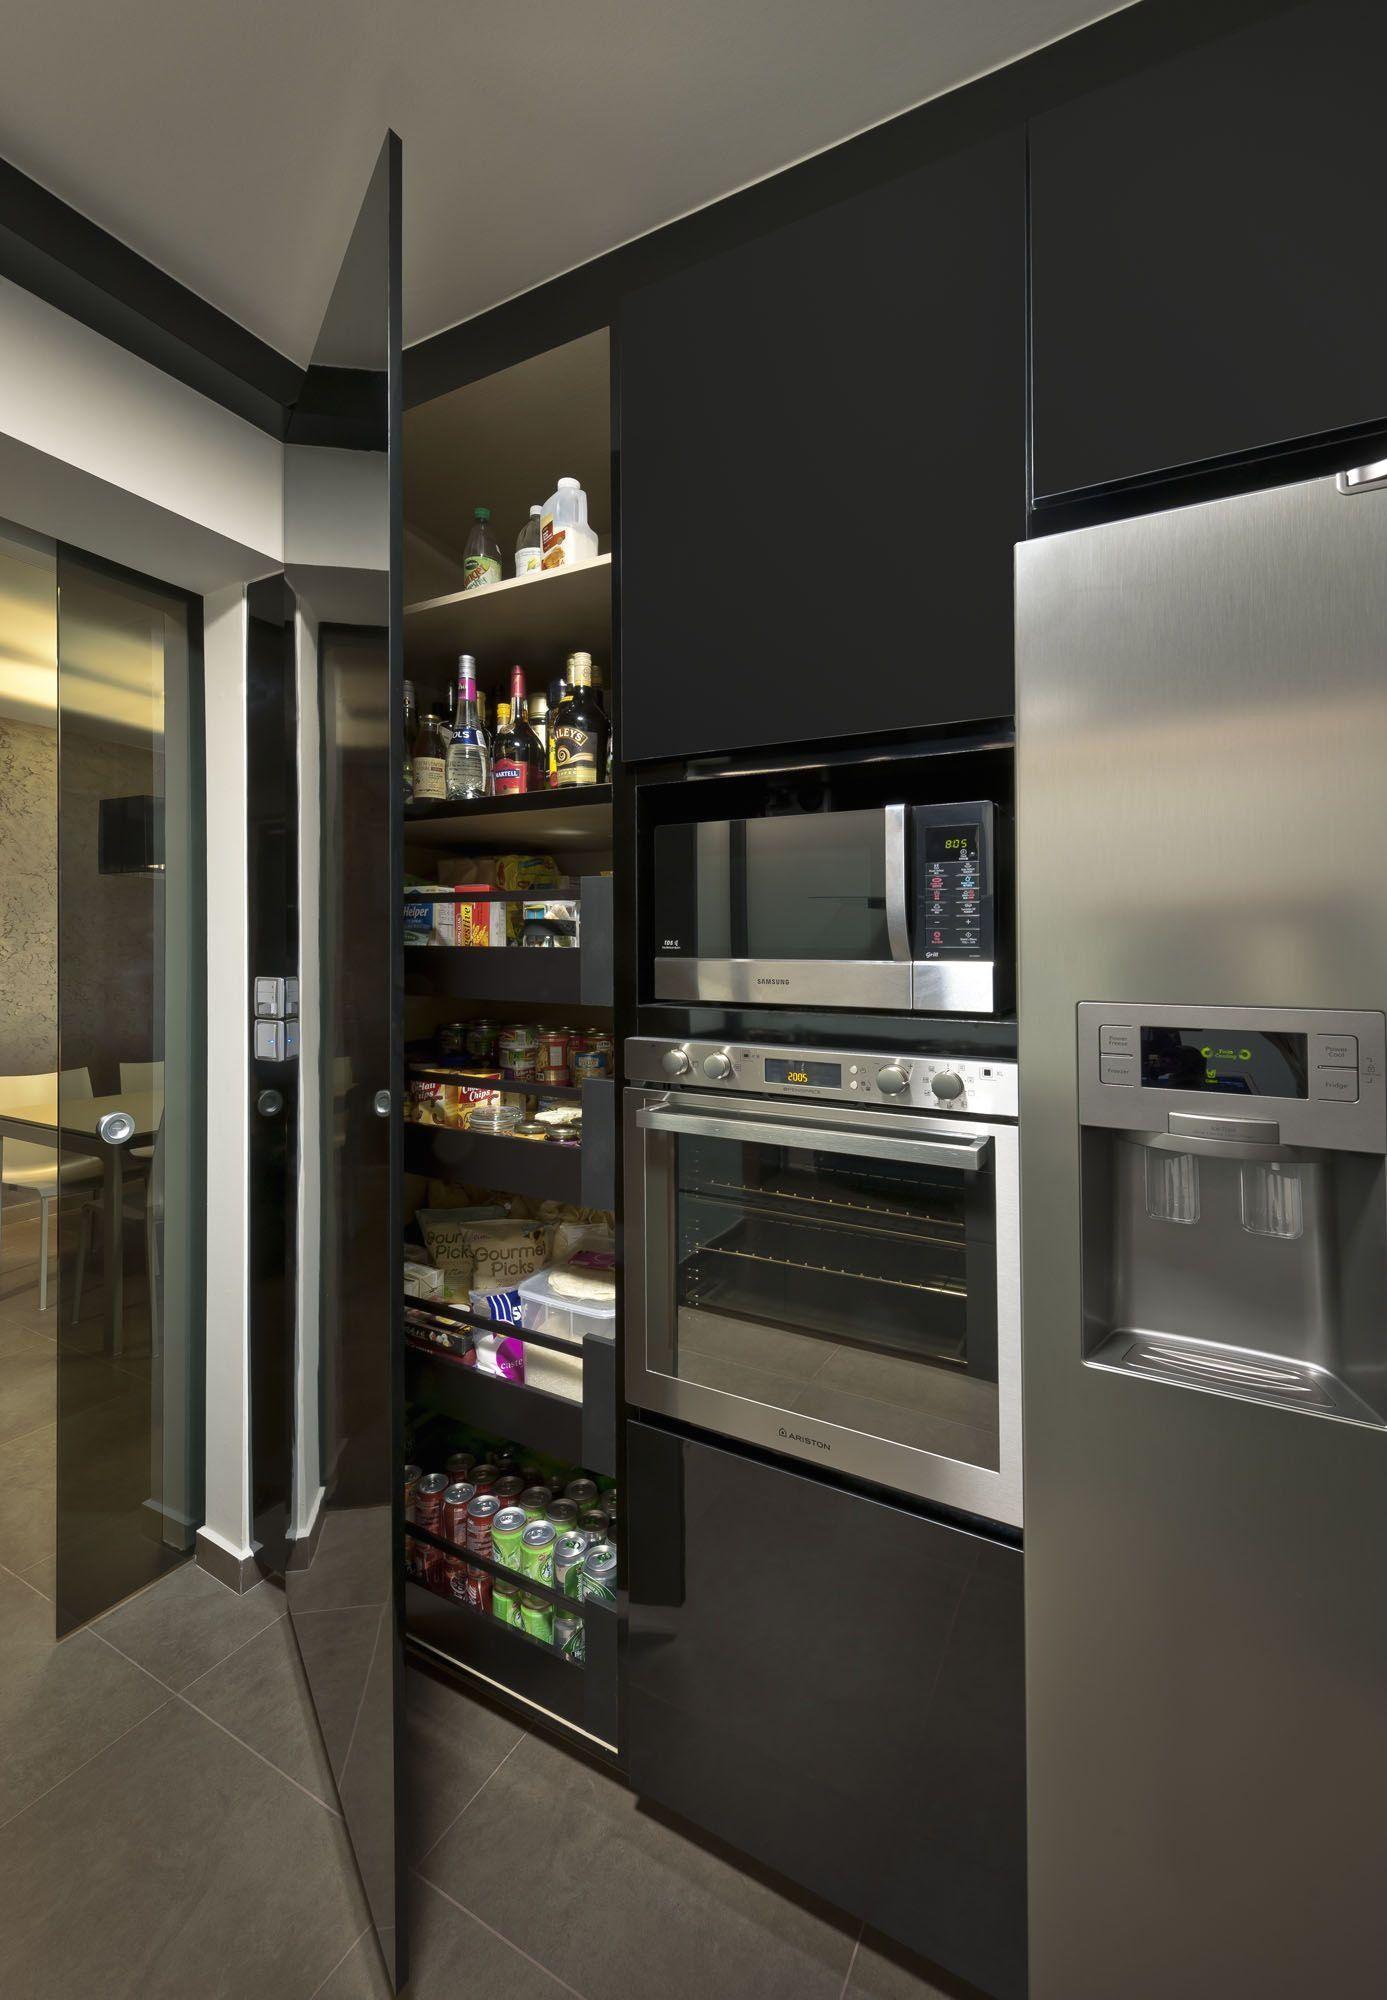 4-Room HDB Yishun Project | Home & Decor Singapore | 1000